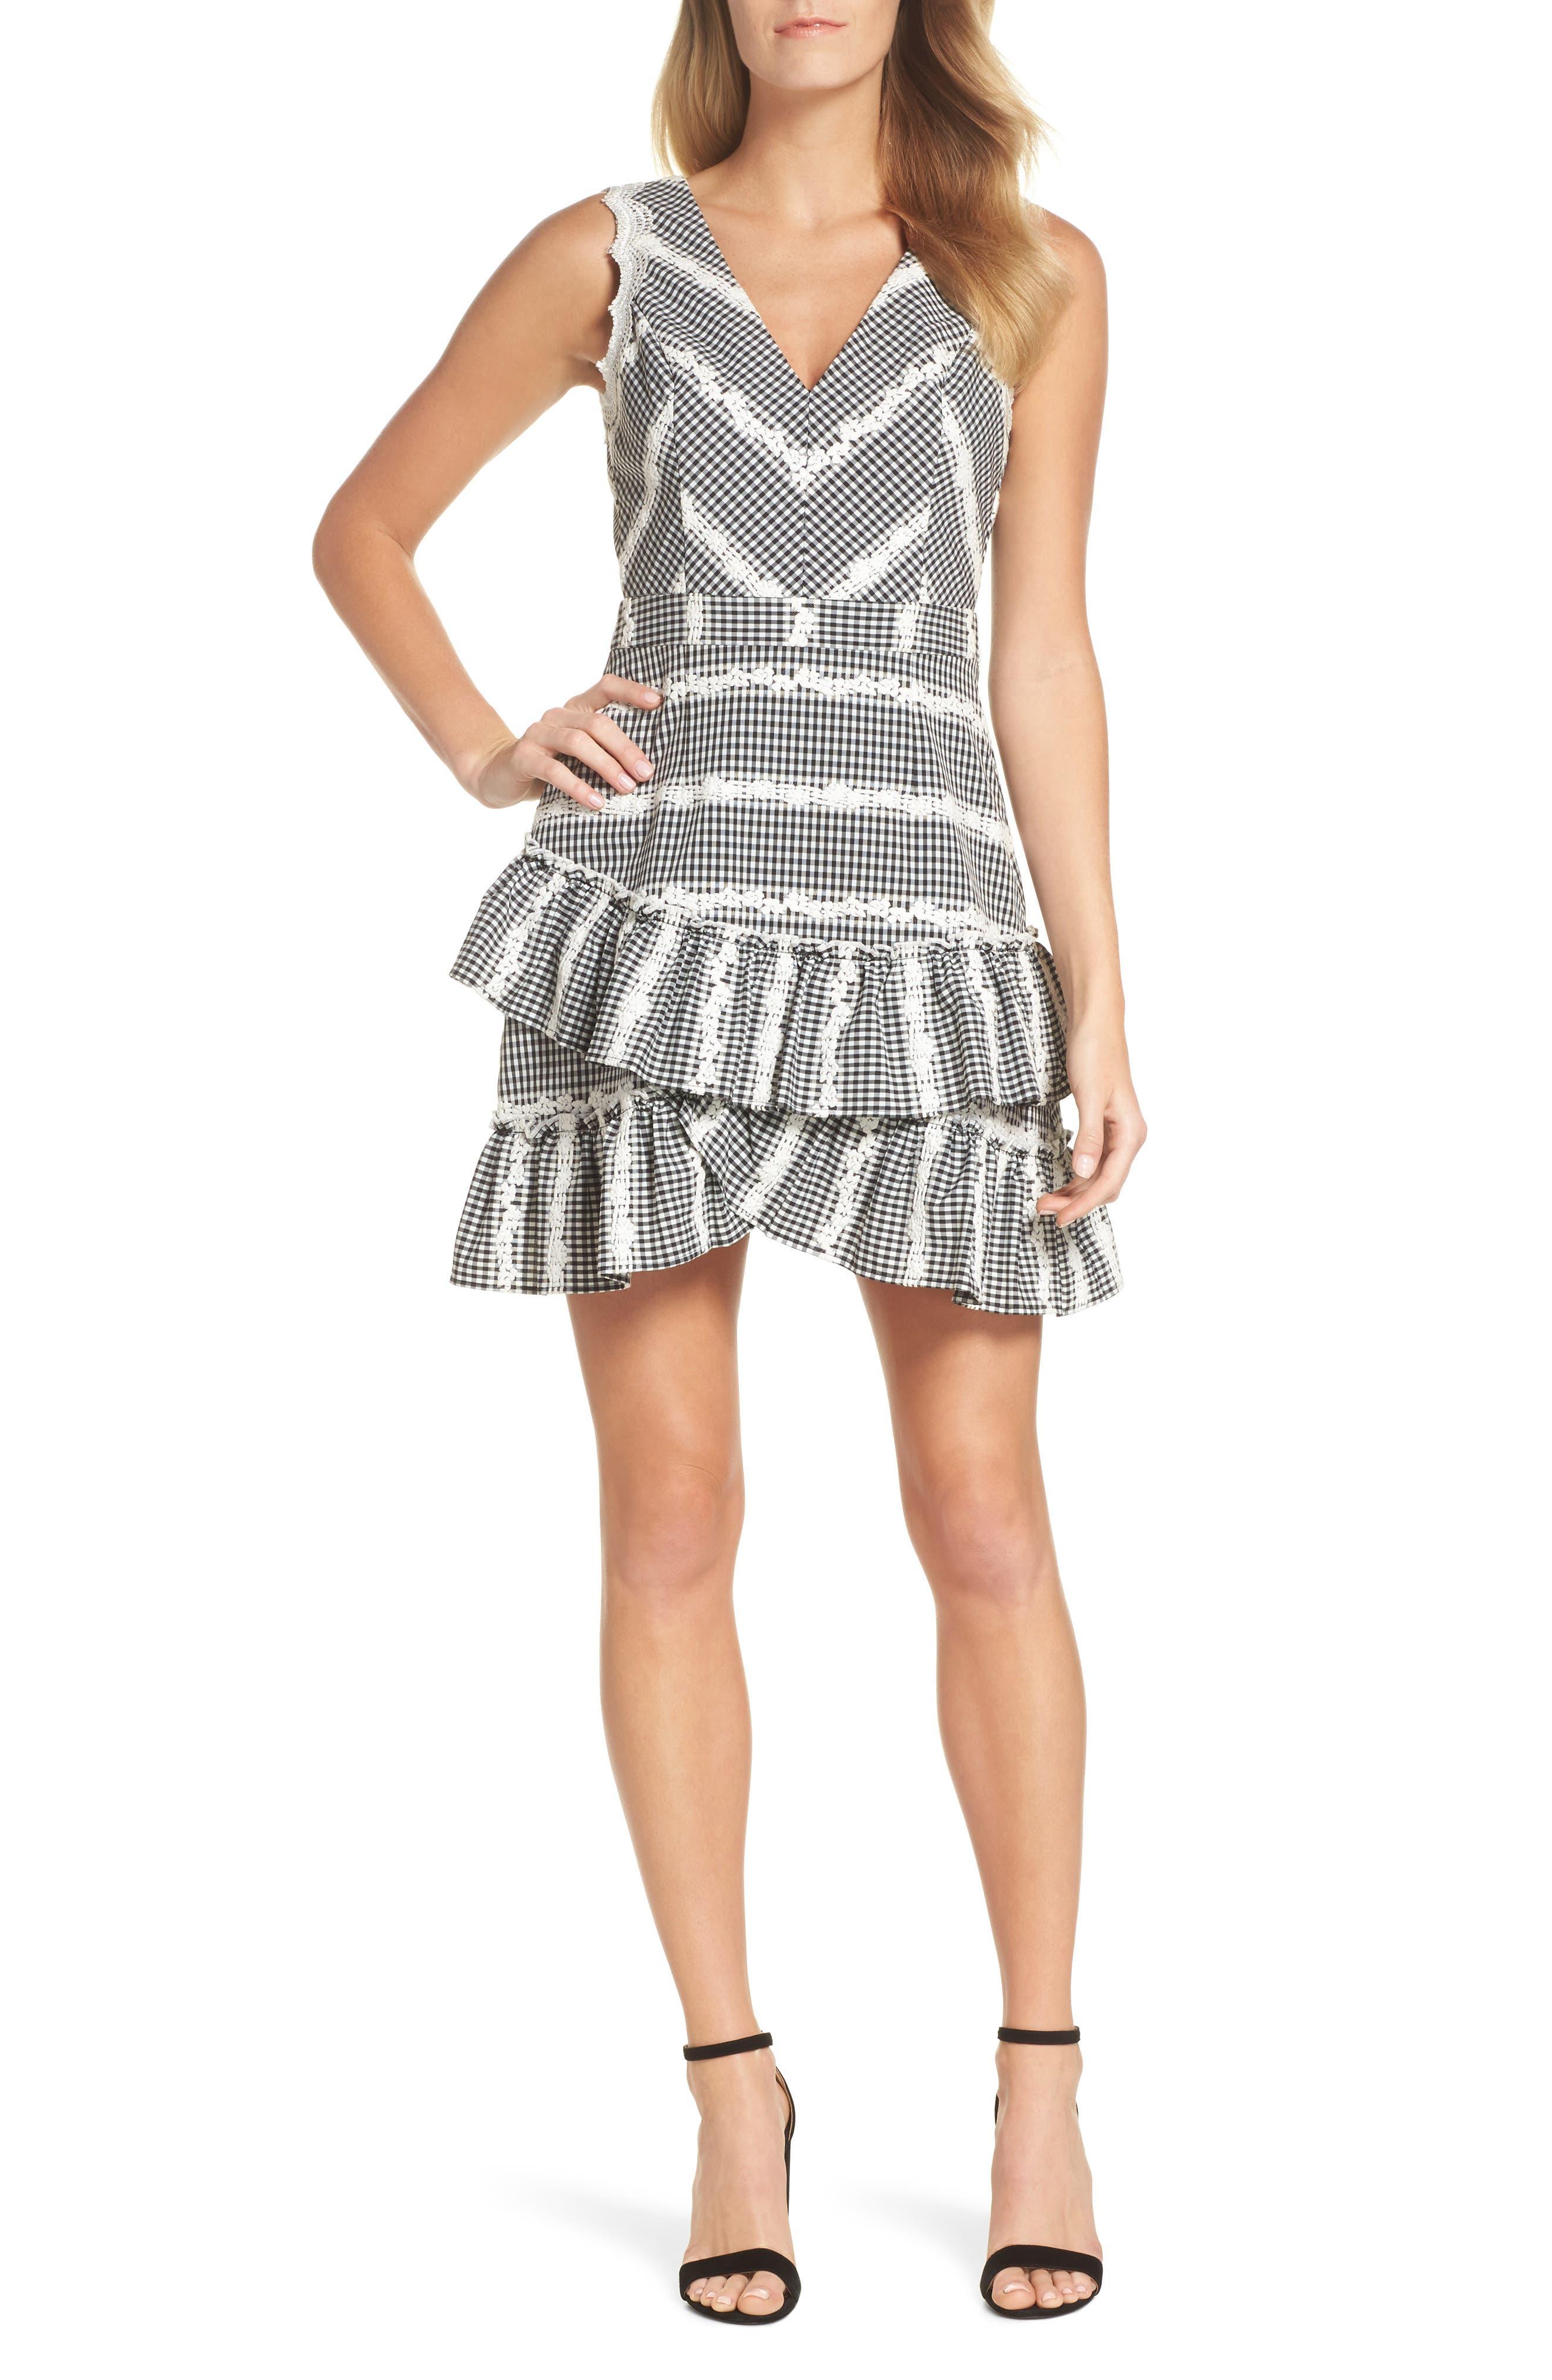 Belle Ruffle Gingham Dress,                             Main thumbnail 1, color,                             Black/ White